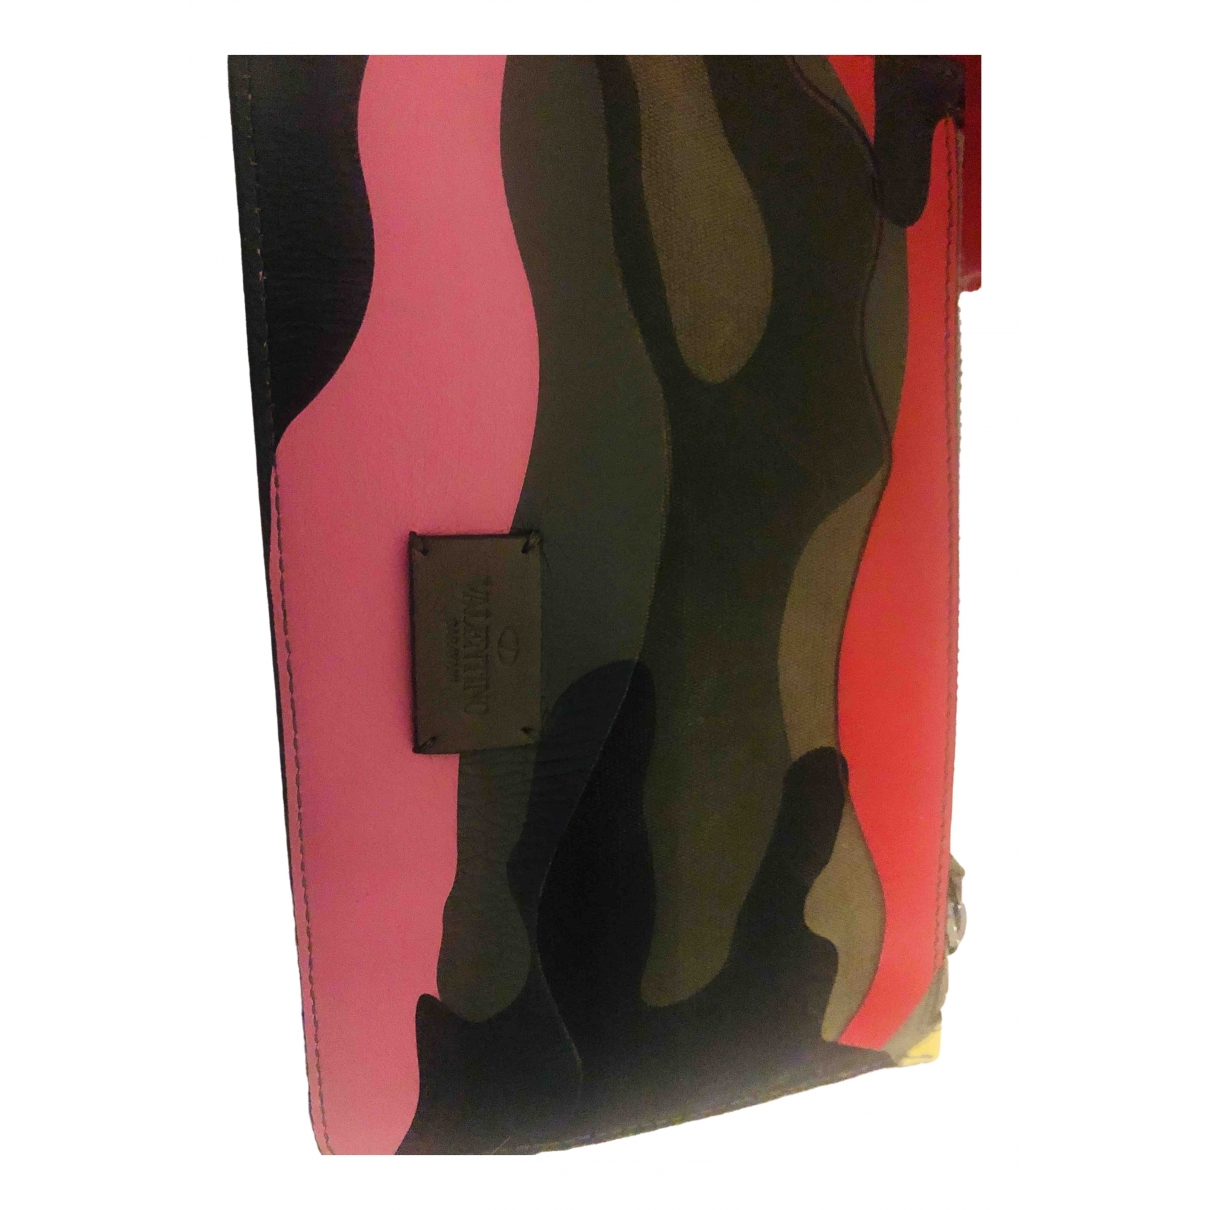 Valentino Garavani \N Multicolour Leather Clutch bag for Women \N